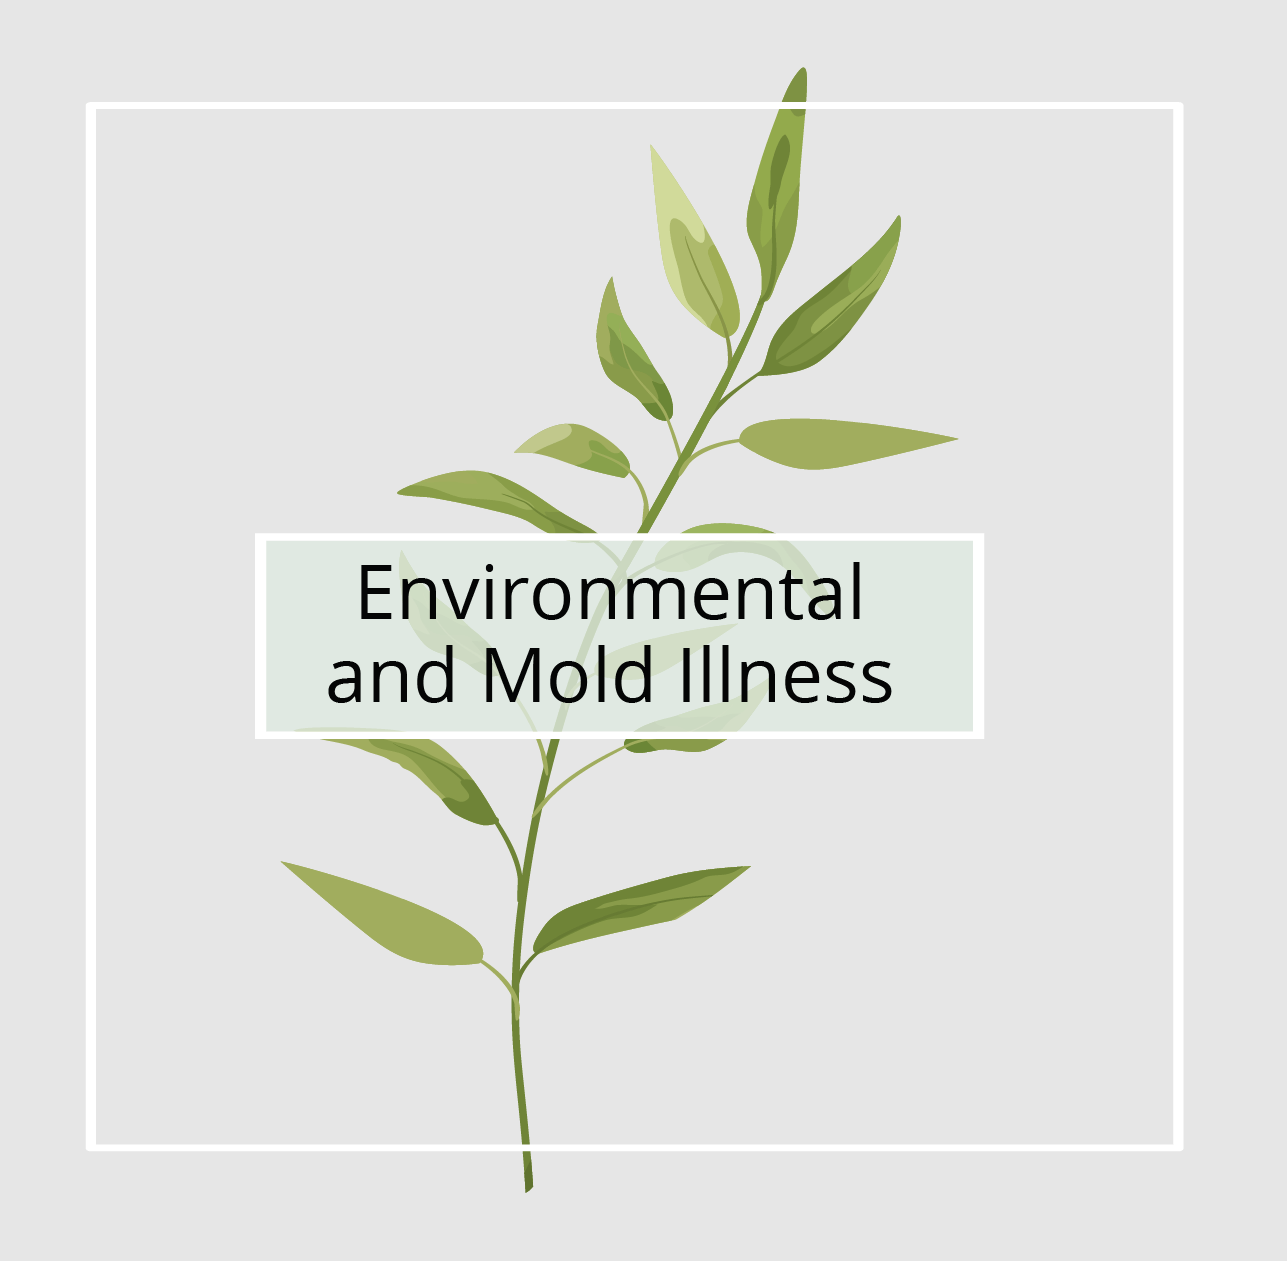 Environmental & Mold Illness - Nature Medica